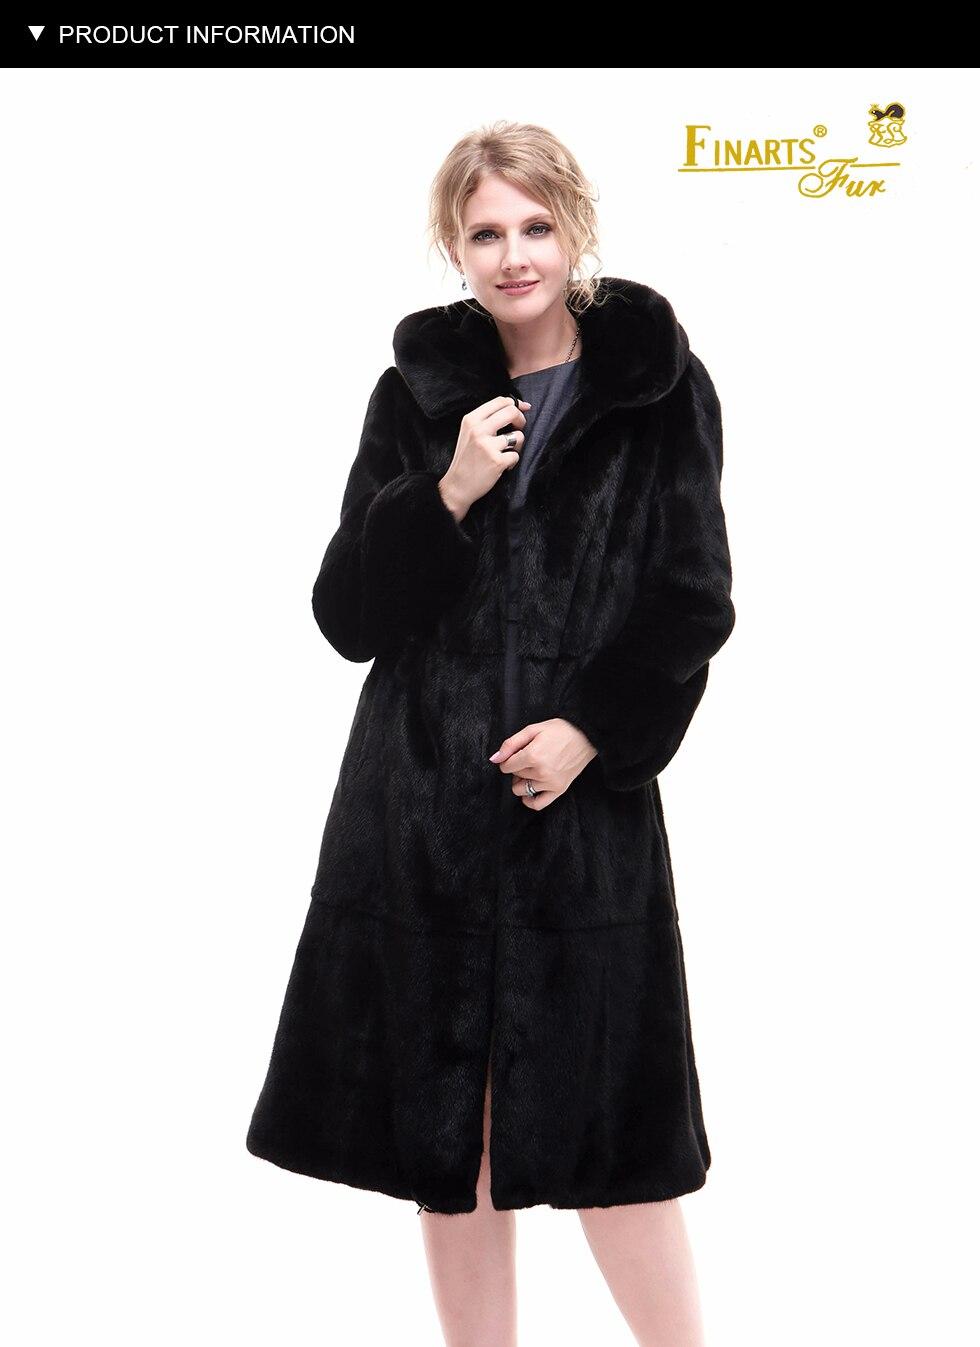 Winter Real Mink Fur Coats For Women New Luxury Fashion Genuine Fur Coats China Female Raccoon Fur Clothing Winter Warm Coats